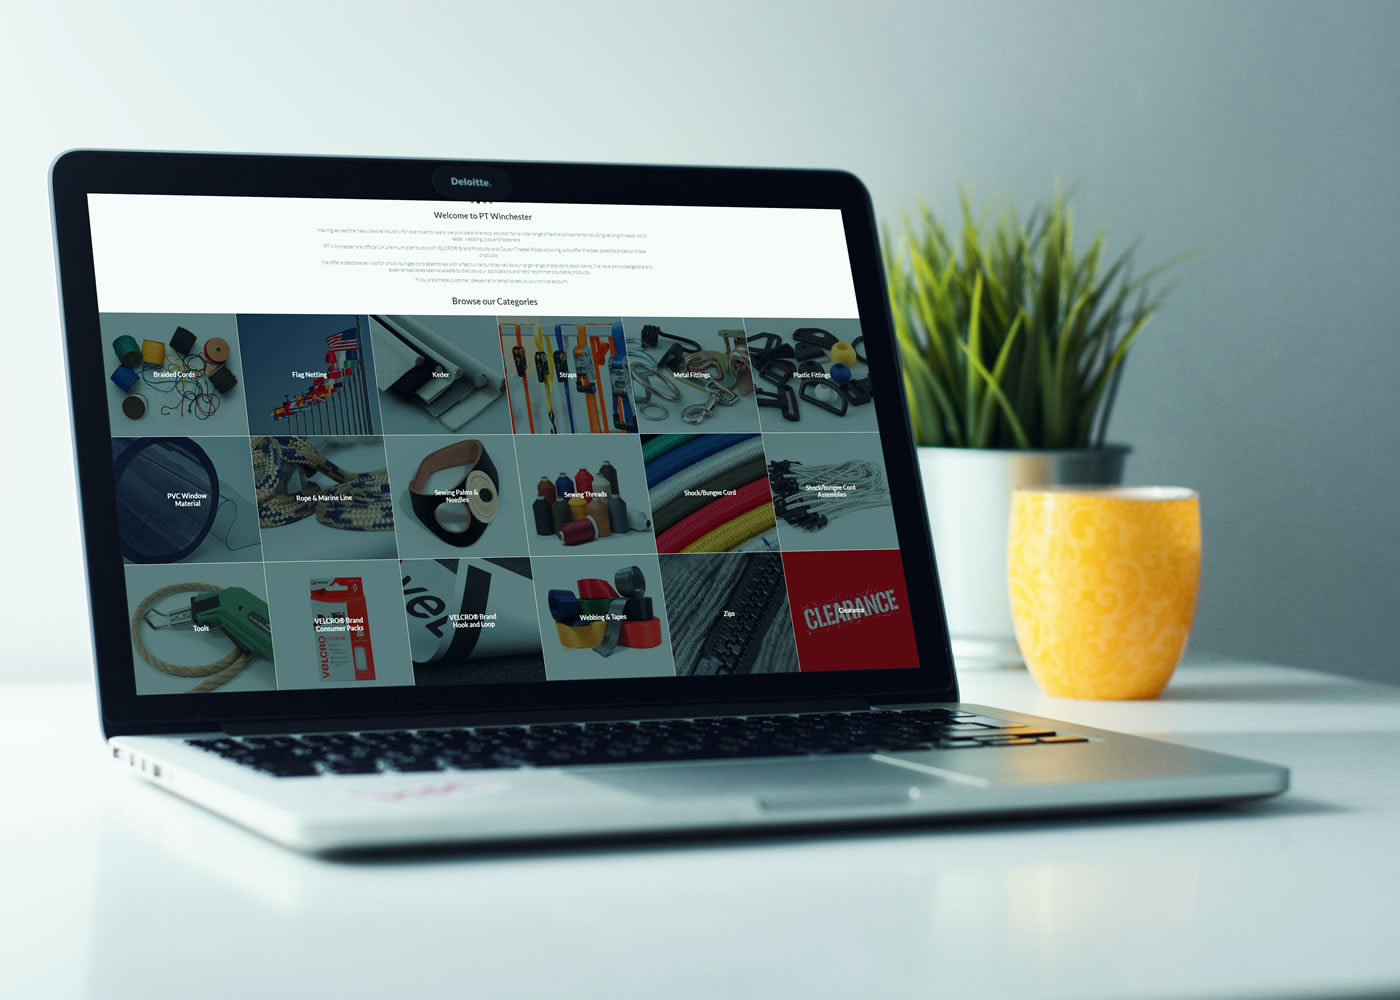 macbook-pt-winchester